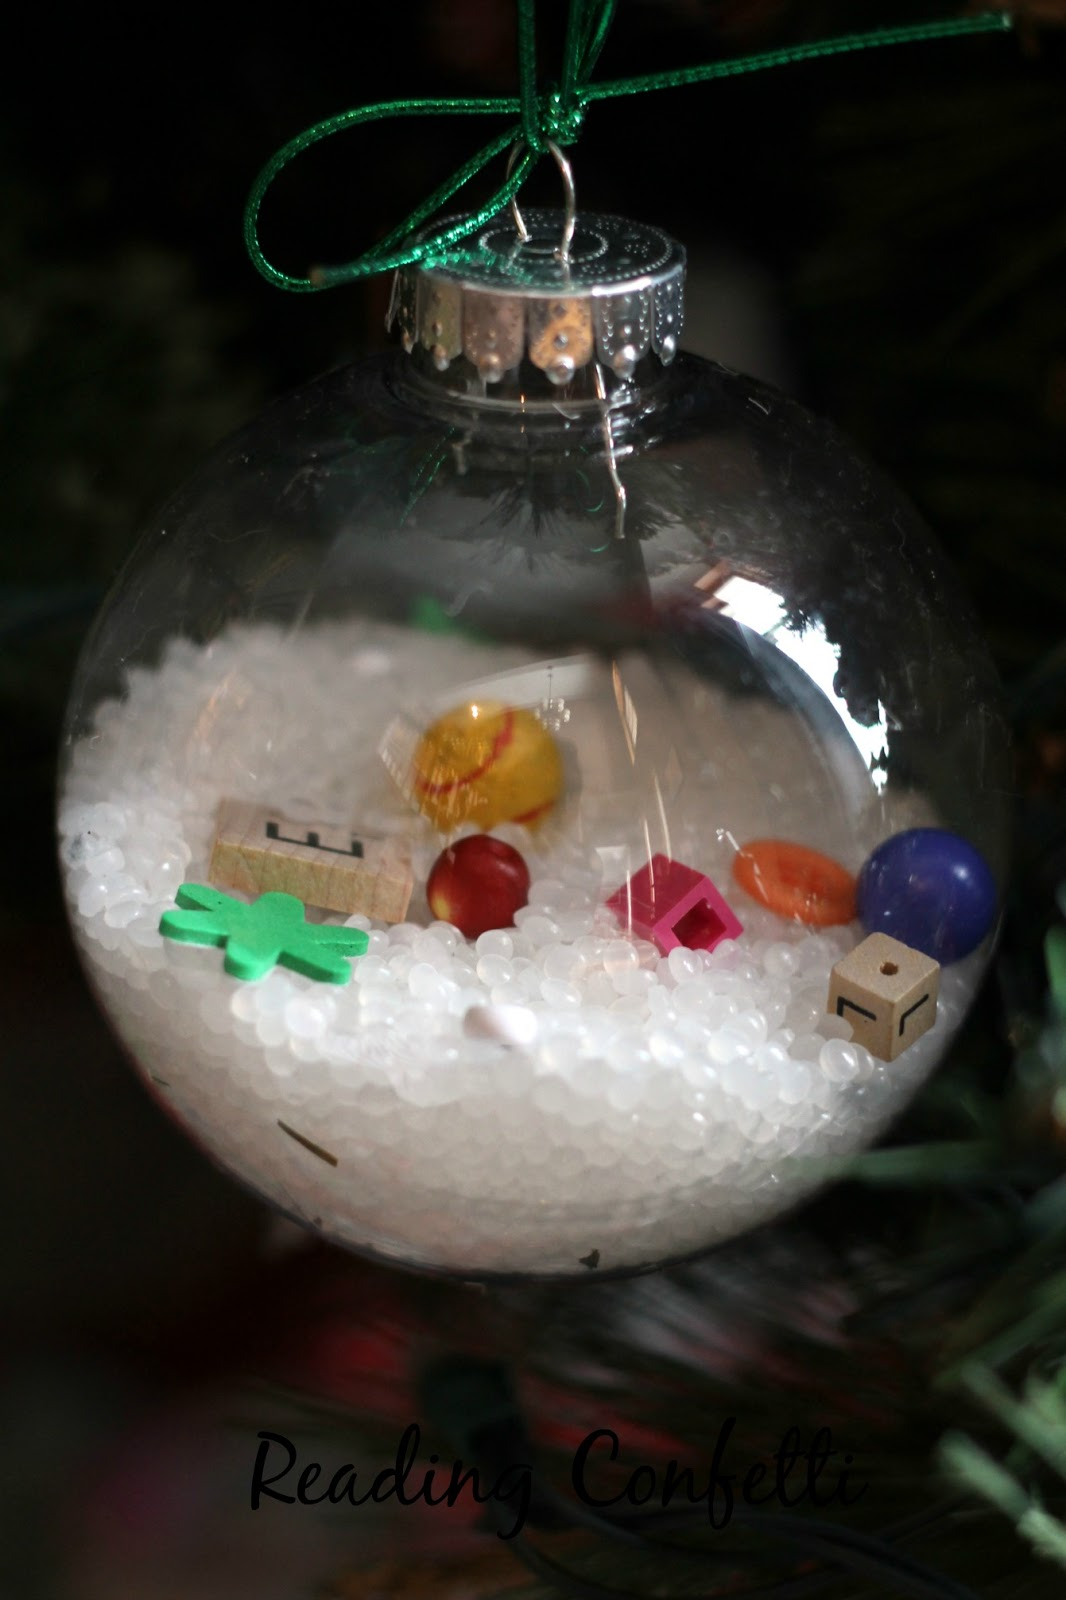 I Spy Christmas Ornaments: Kid-Made Gift ~ Reading Confetti